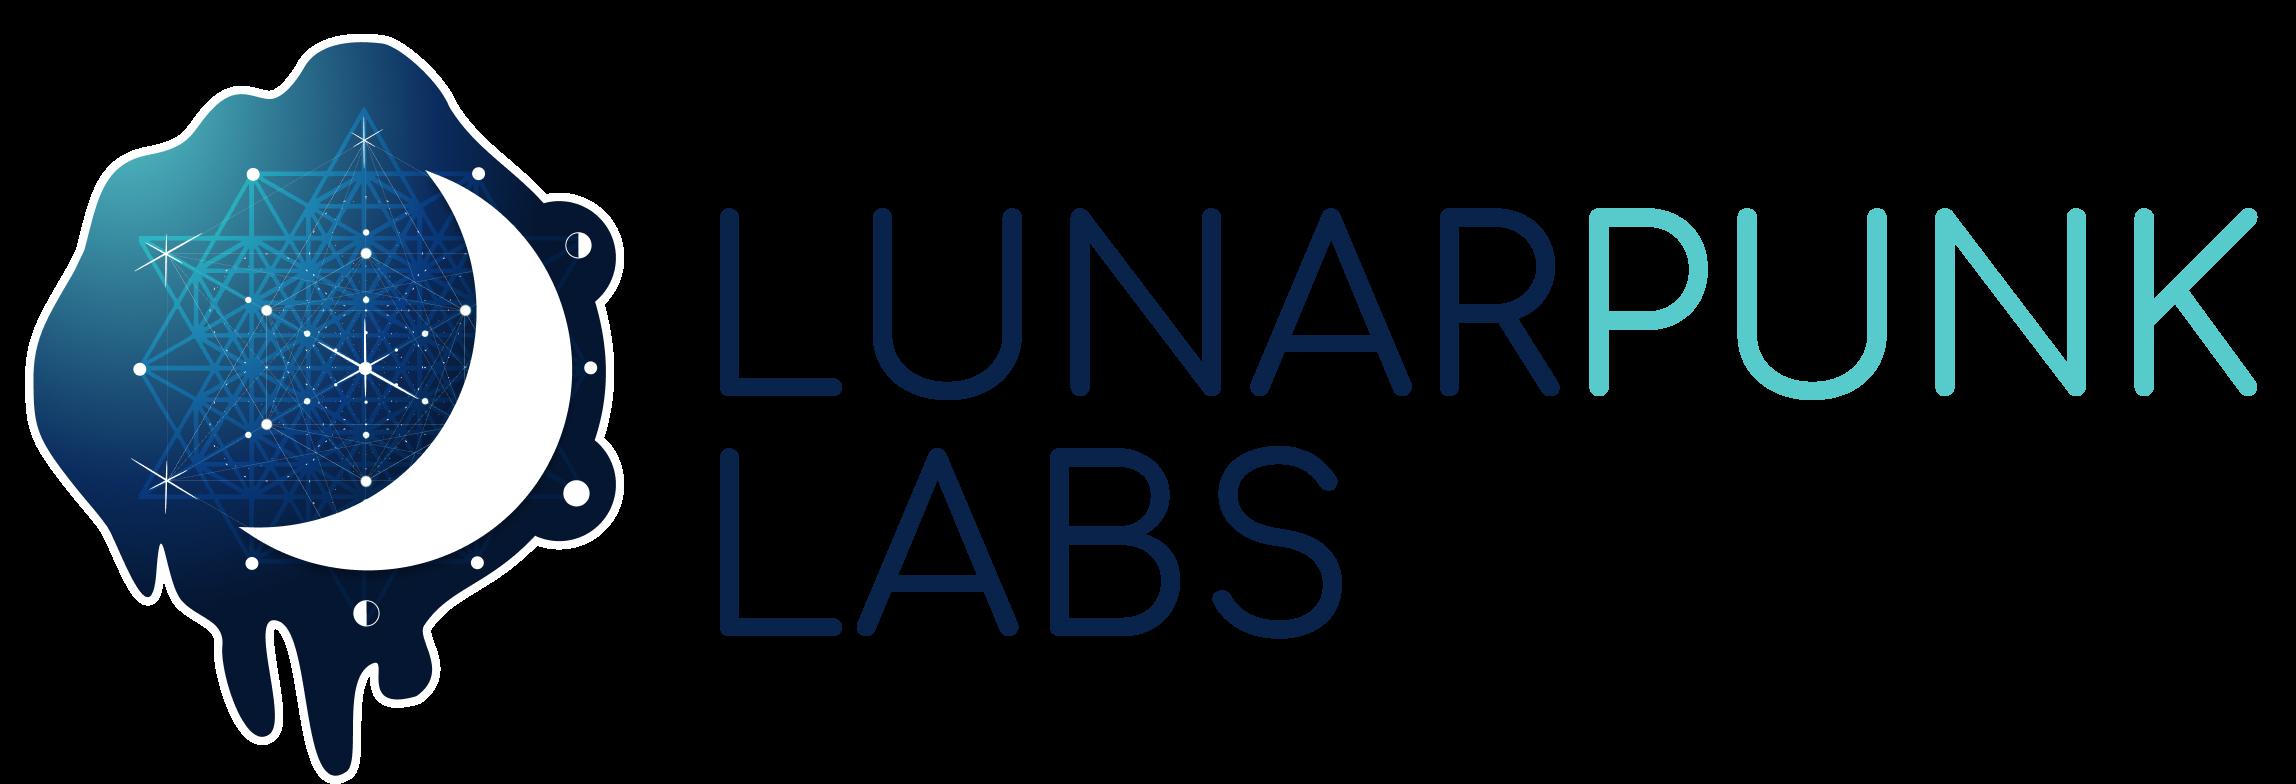 LunarPunk Labs